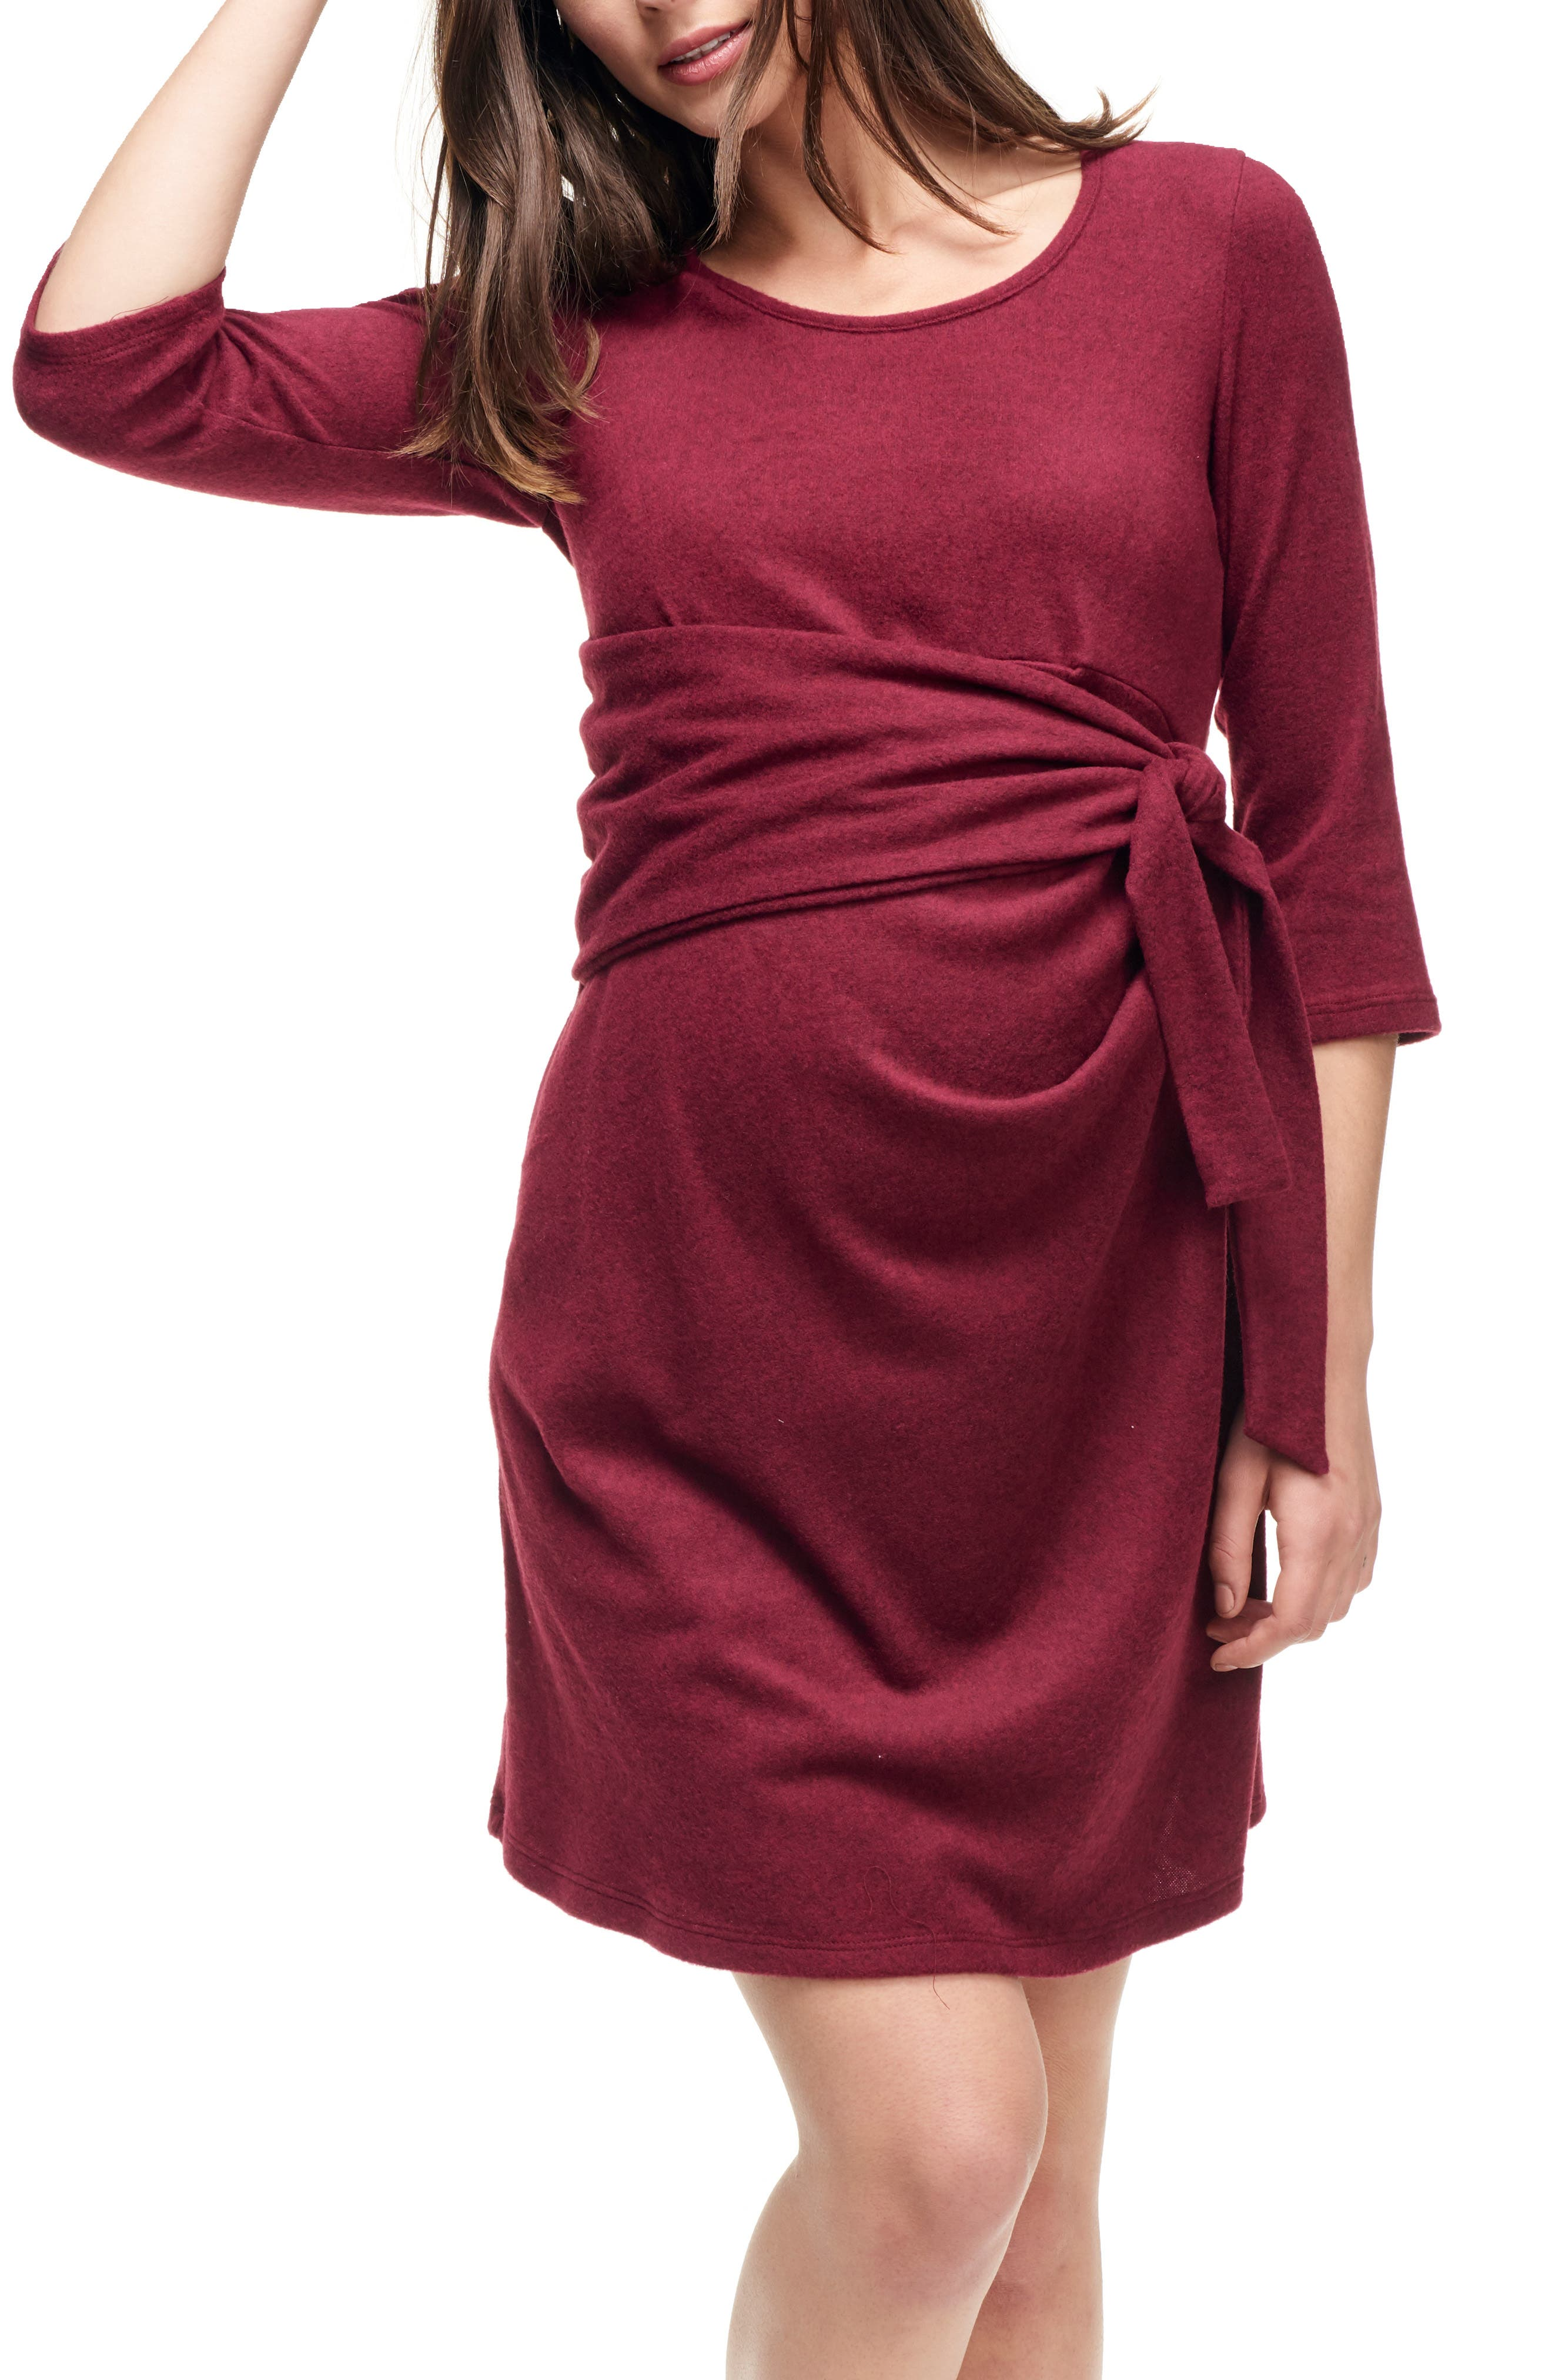 Maternal America Faux Wrap Maternity Dress, Burgundy